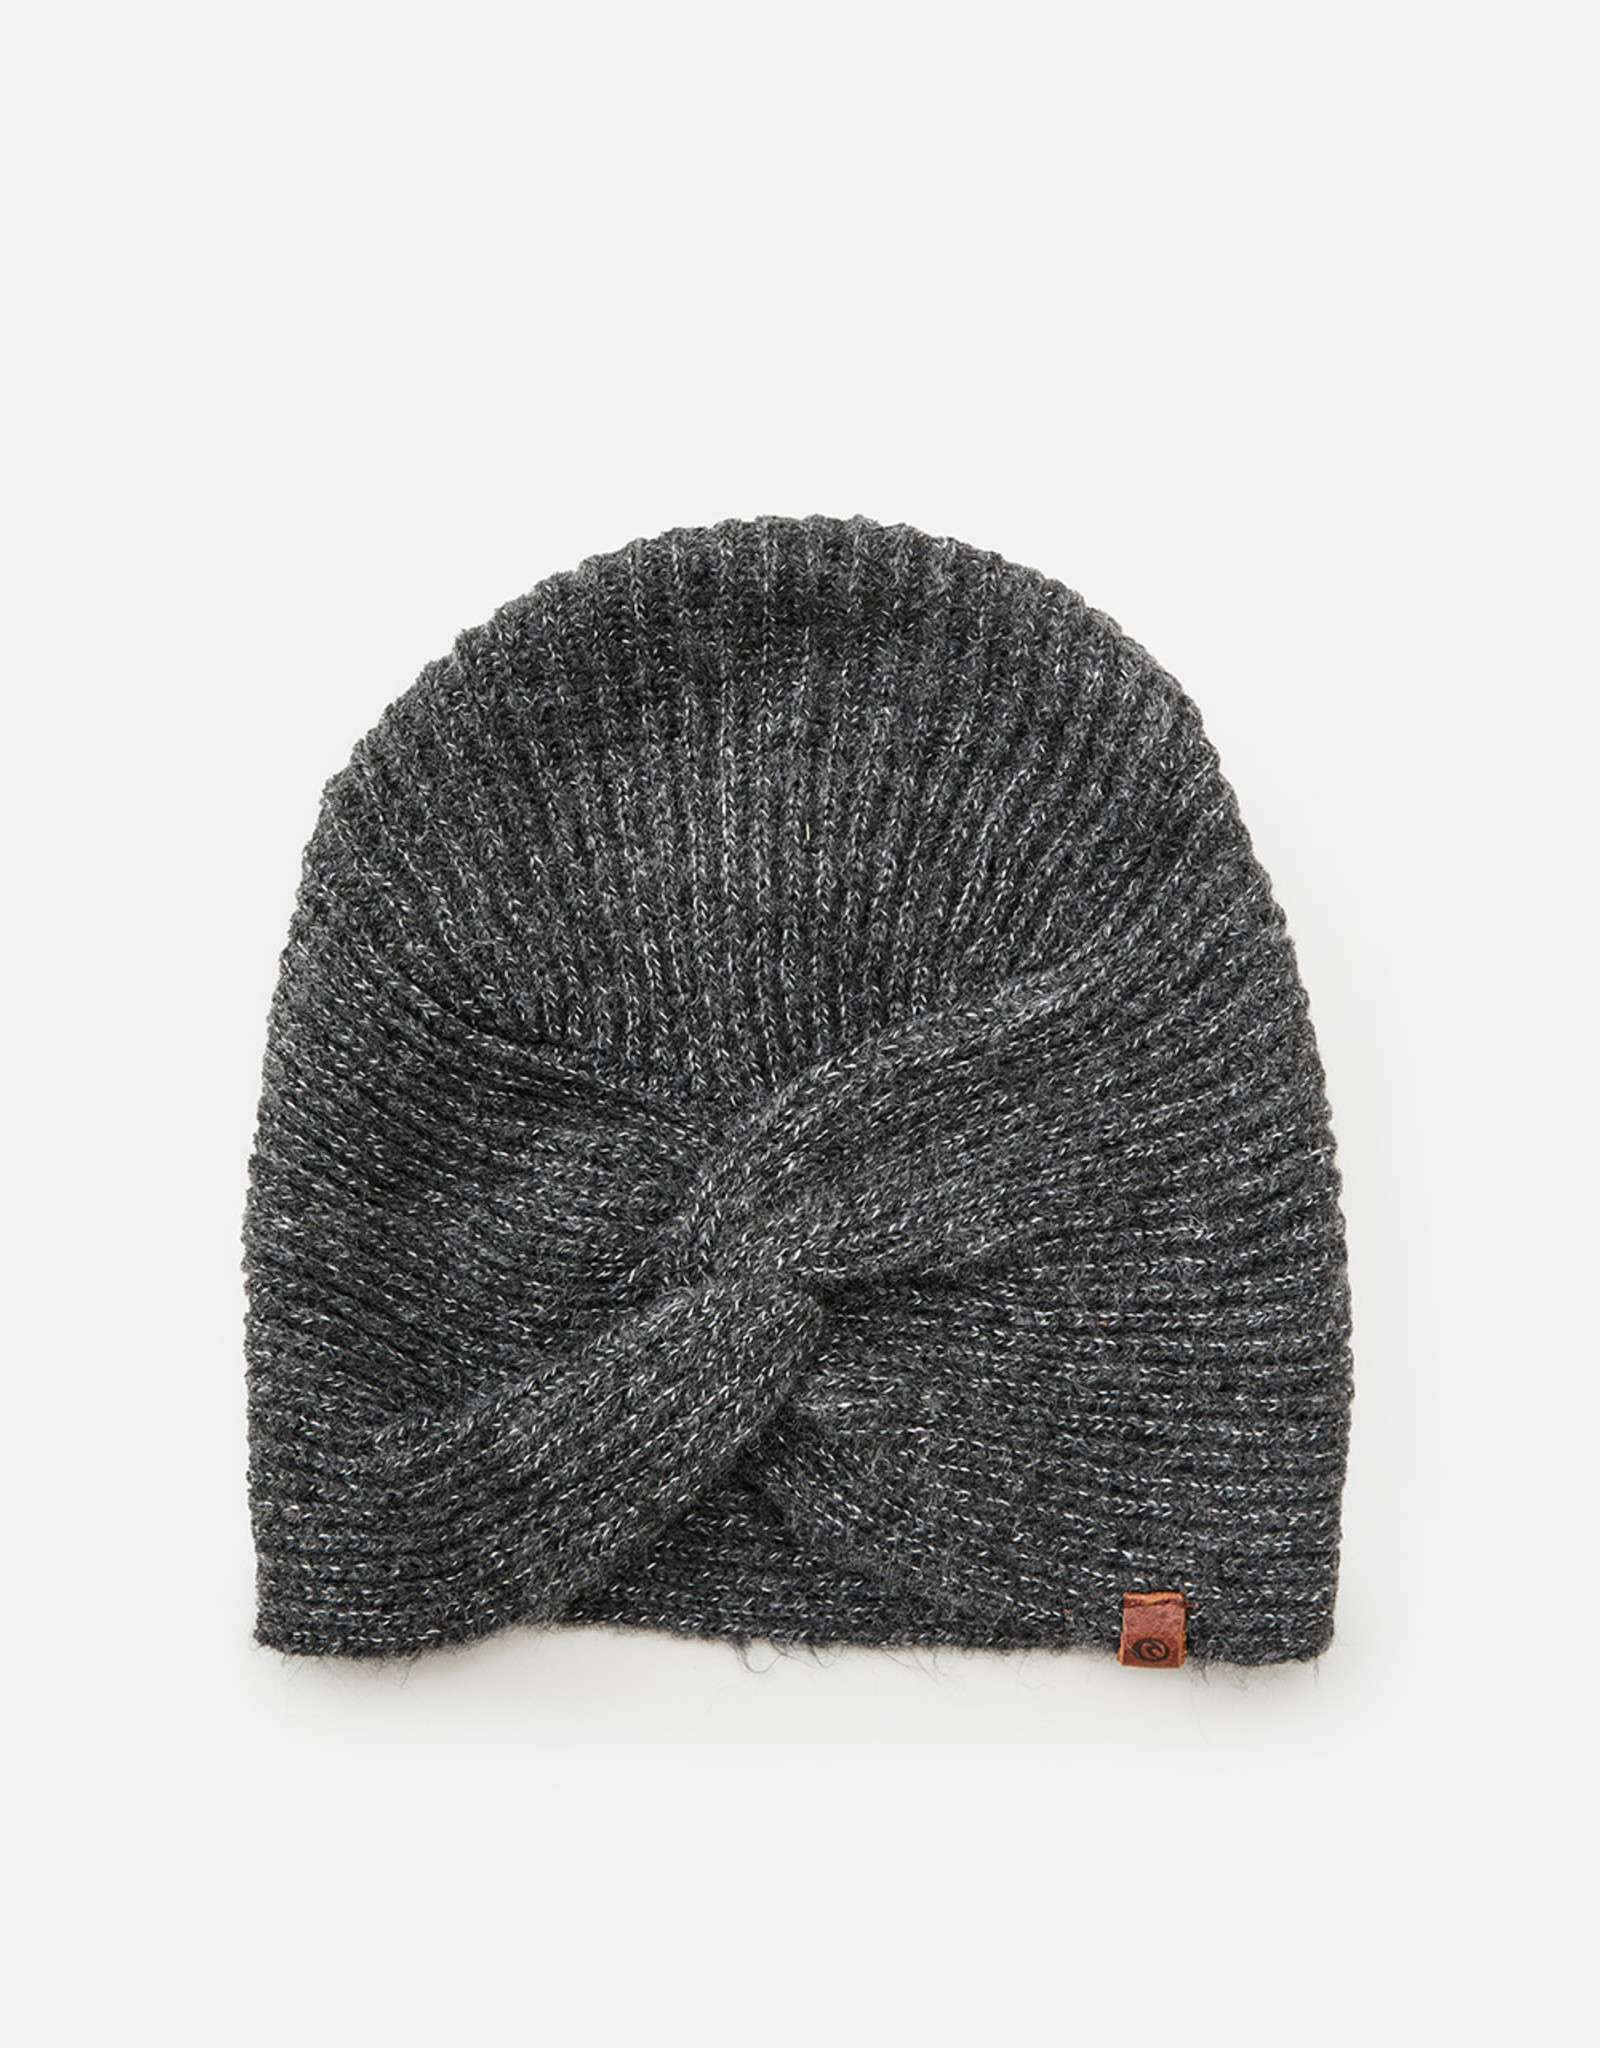 Rip Curl Twisted Turban